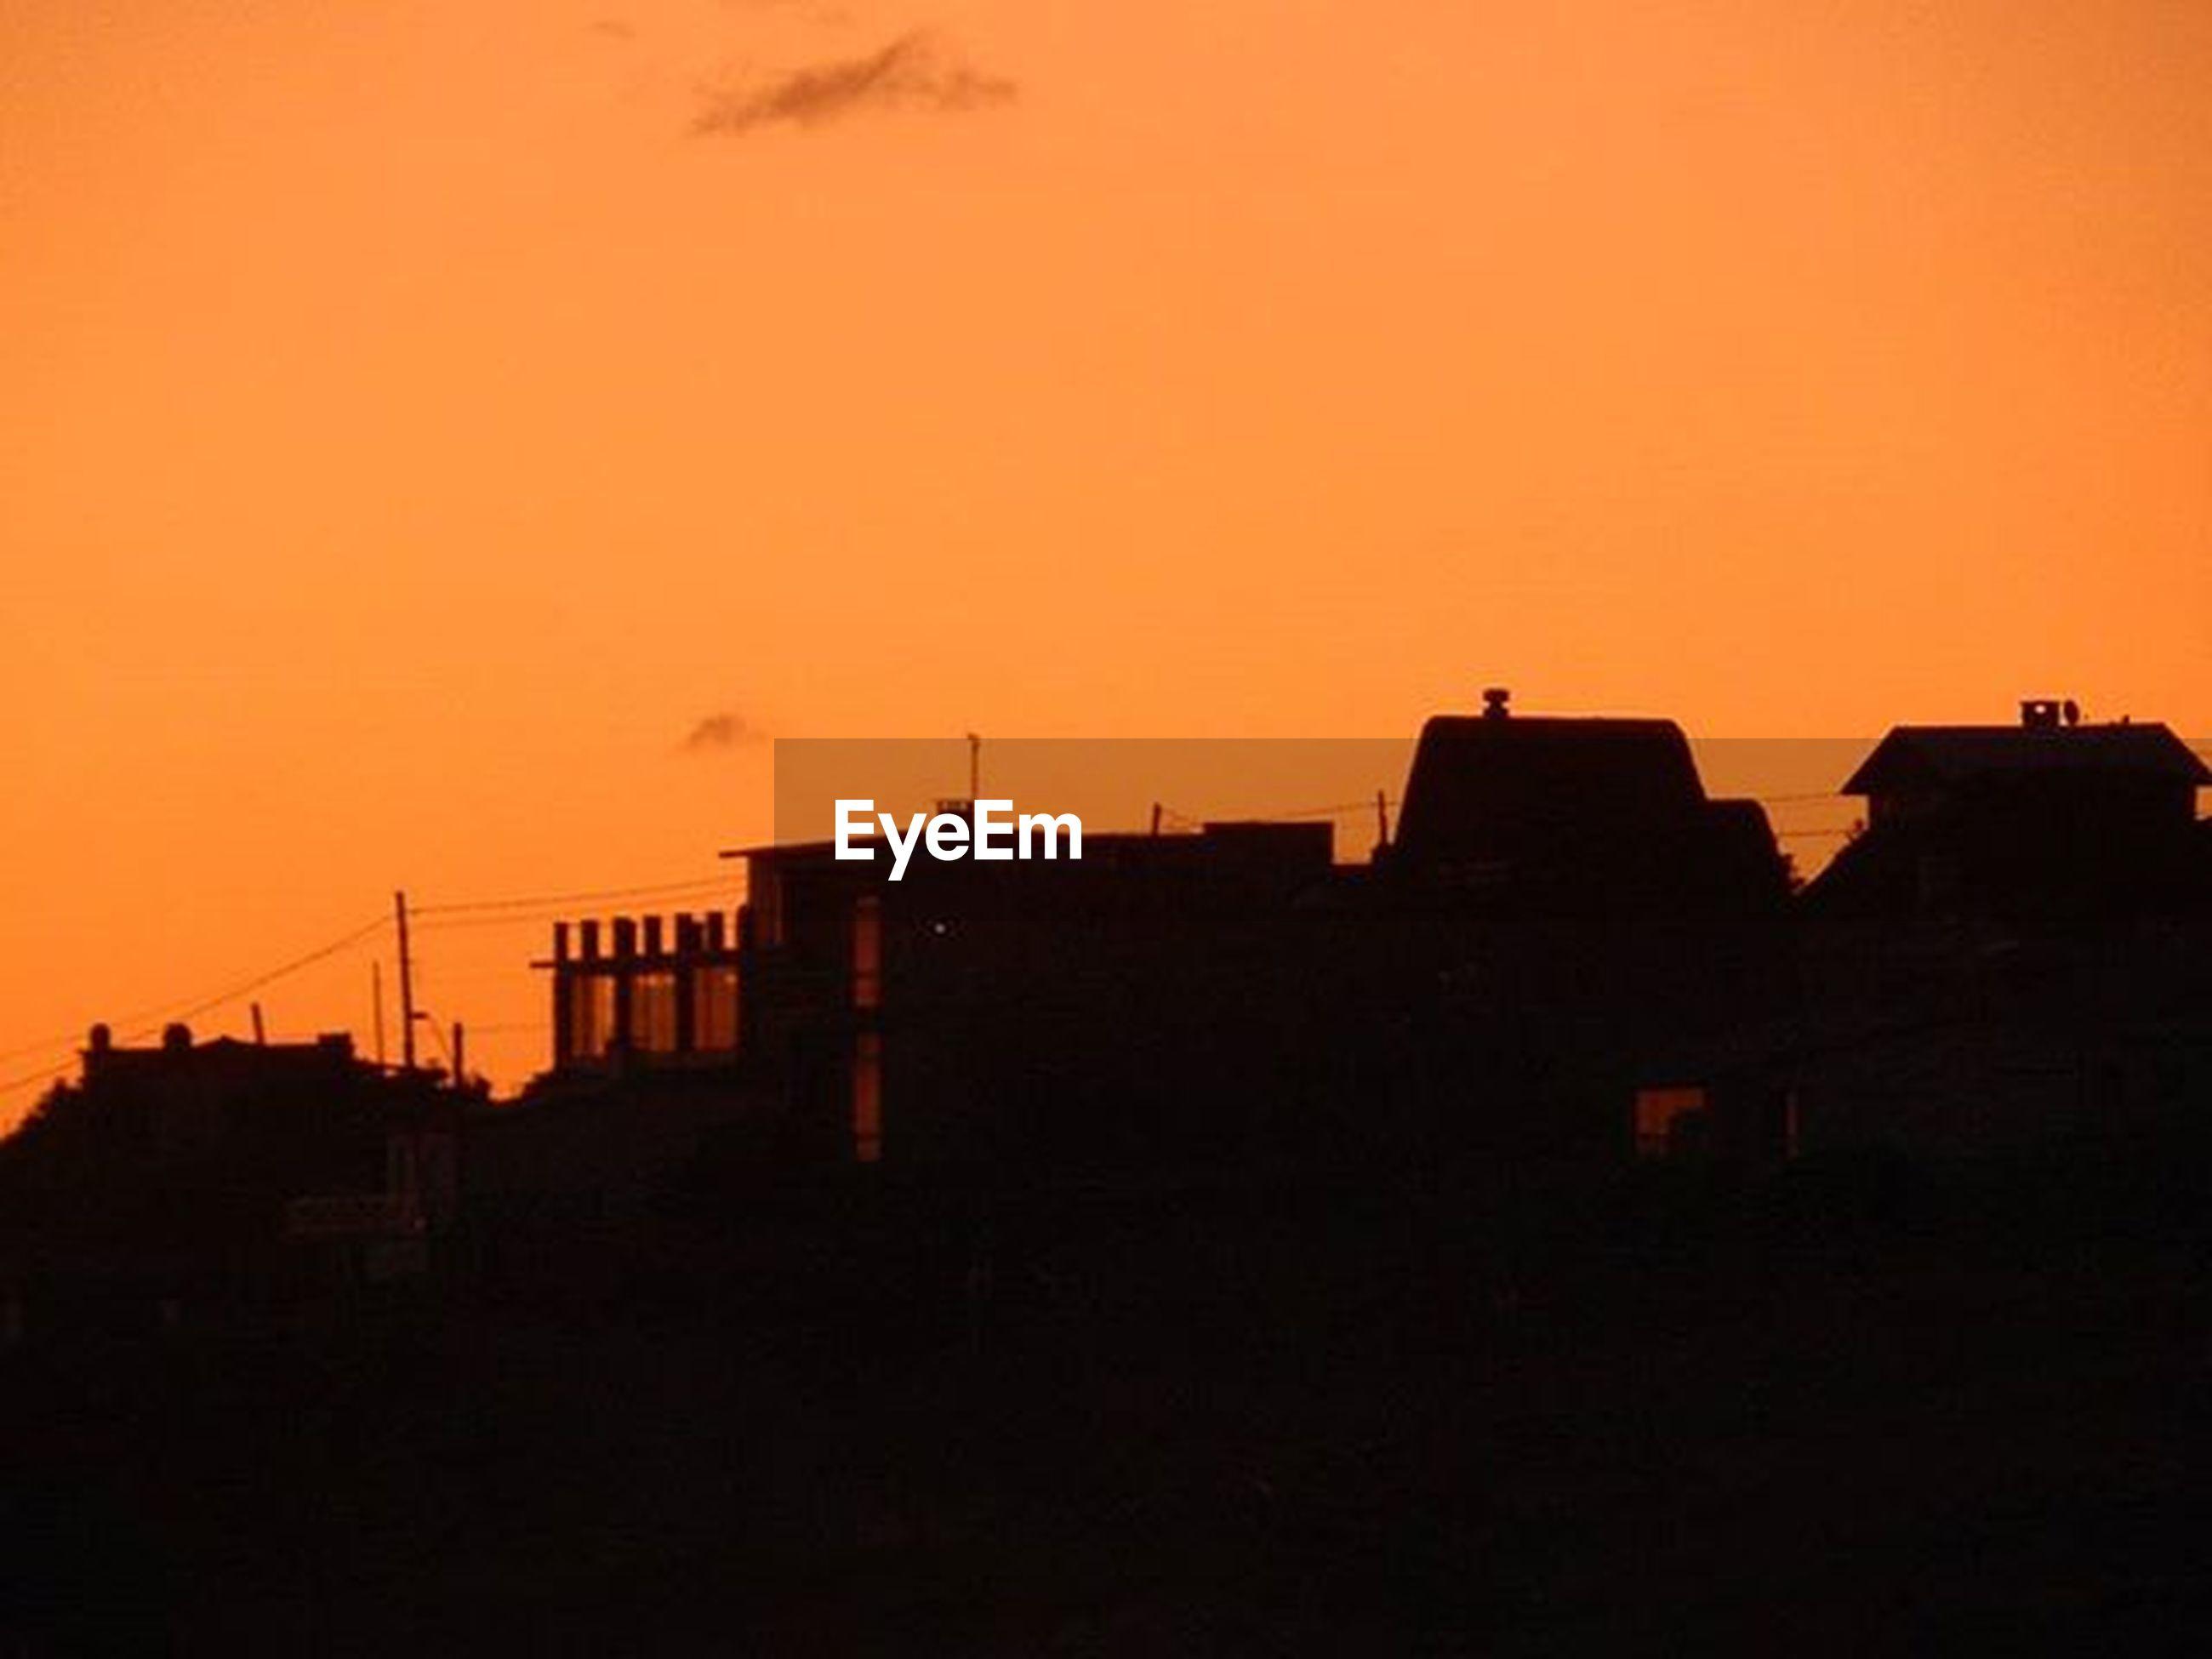 sunset, architecture, building exterior, built structure, silhouette, orange color, copy space, house, residential structure, residential building, clear sky, building, city, sky, outdoors, low angle view, dusk, no people, nature, development